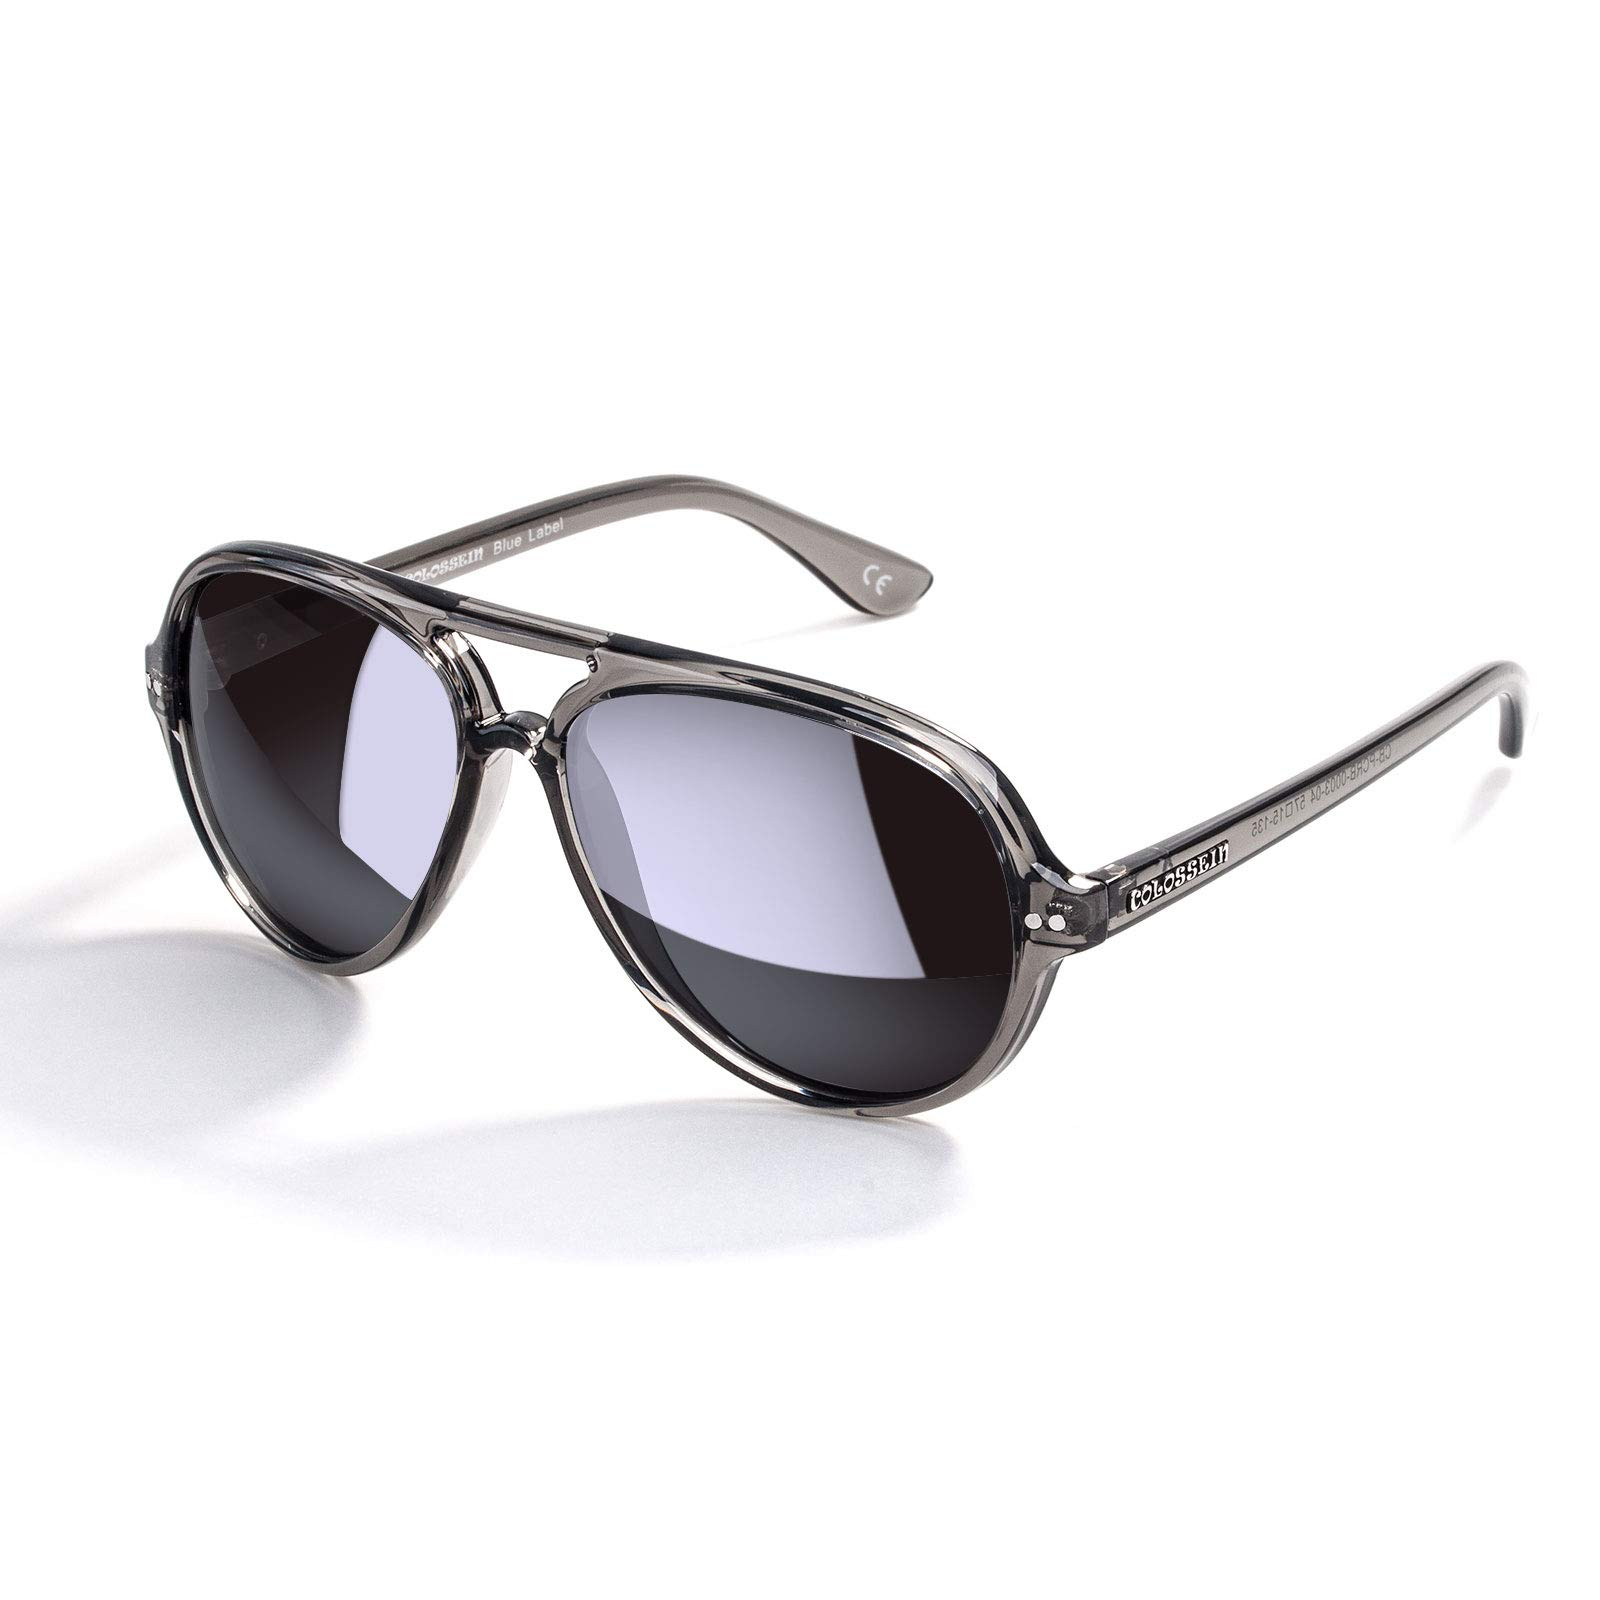 Womens Retro Polarized Sunglasses, Mirrored Lens Fashion Goggle Eyewear(Grey Lens/Grey Frame) by PINGLAS